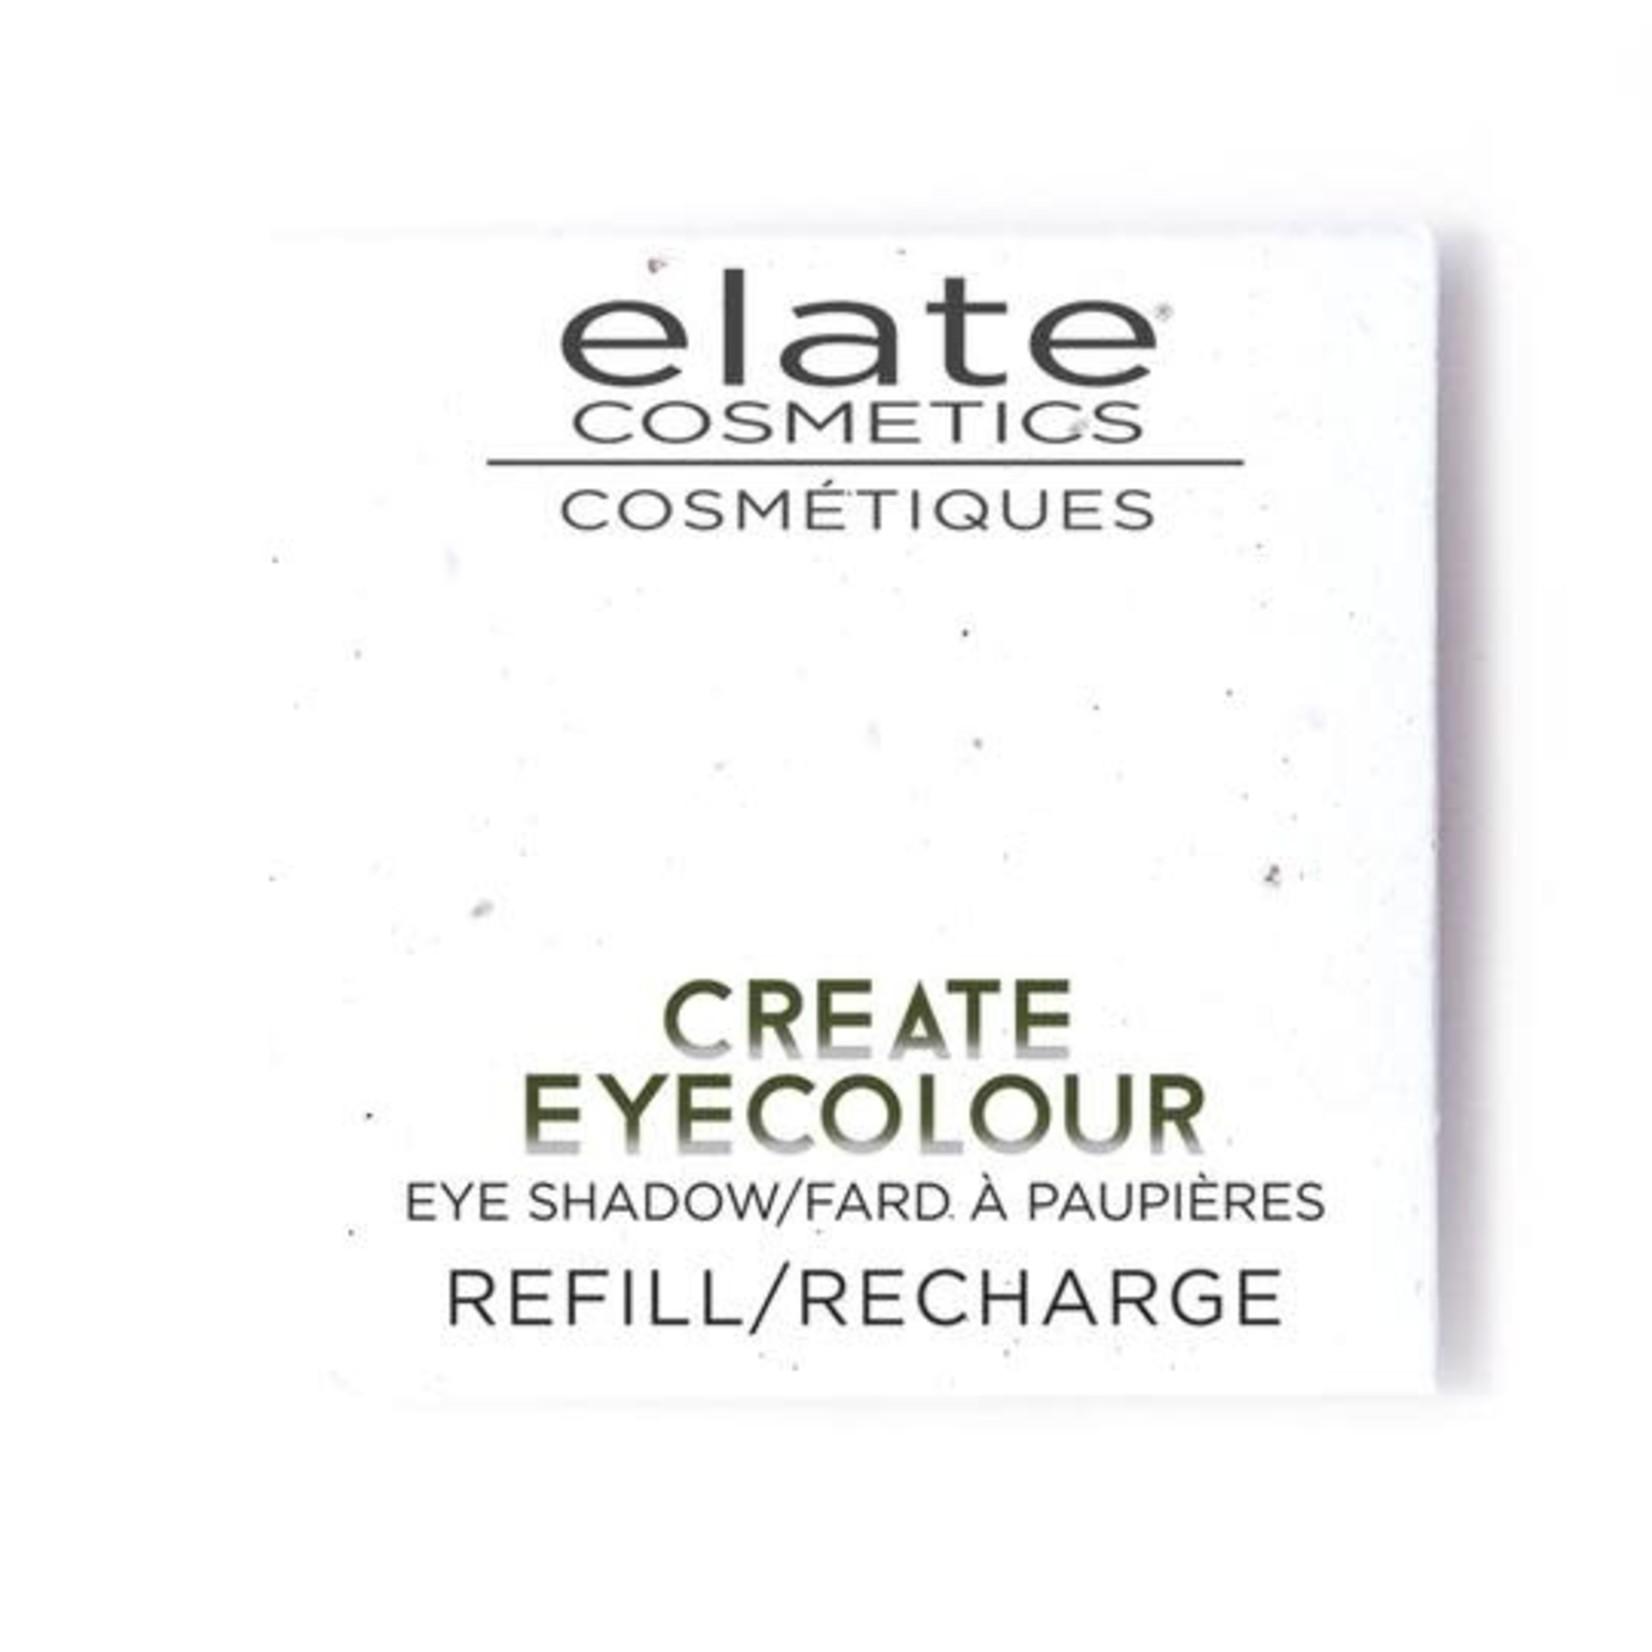 ELATE COSMETICS PRESSED EYECOLOUR - UNION